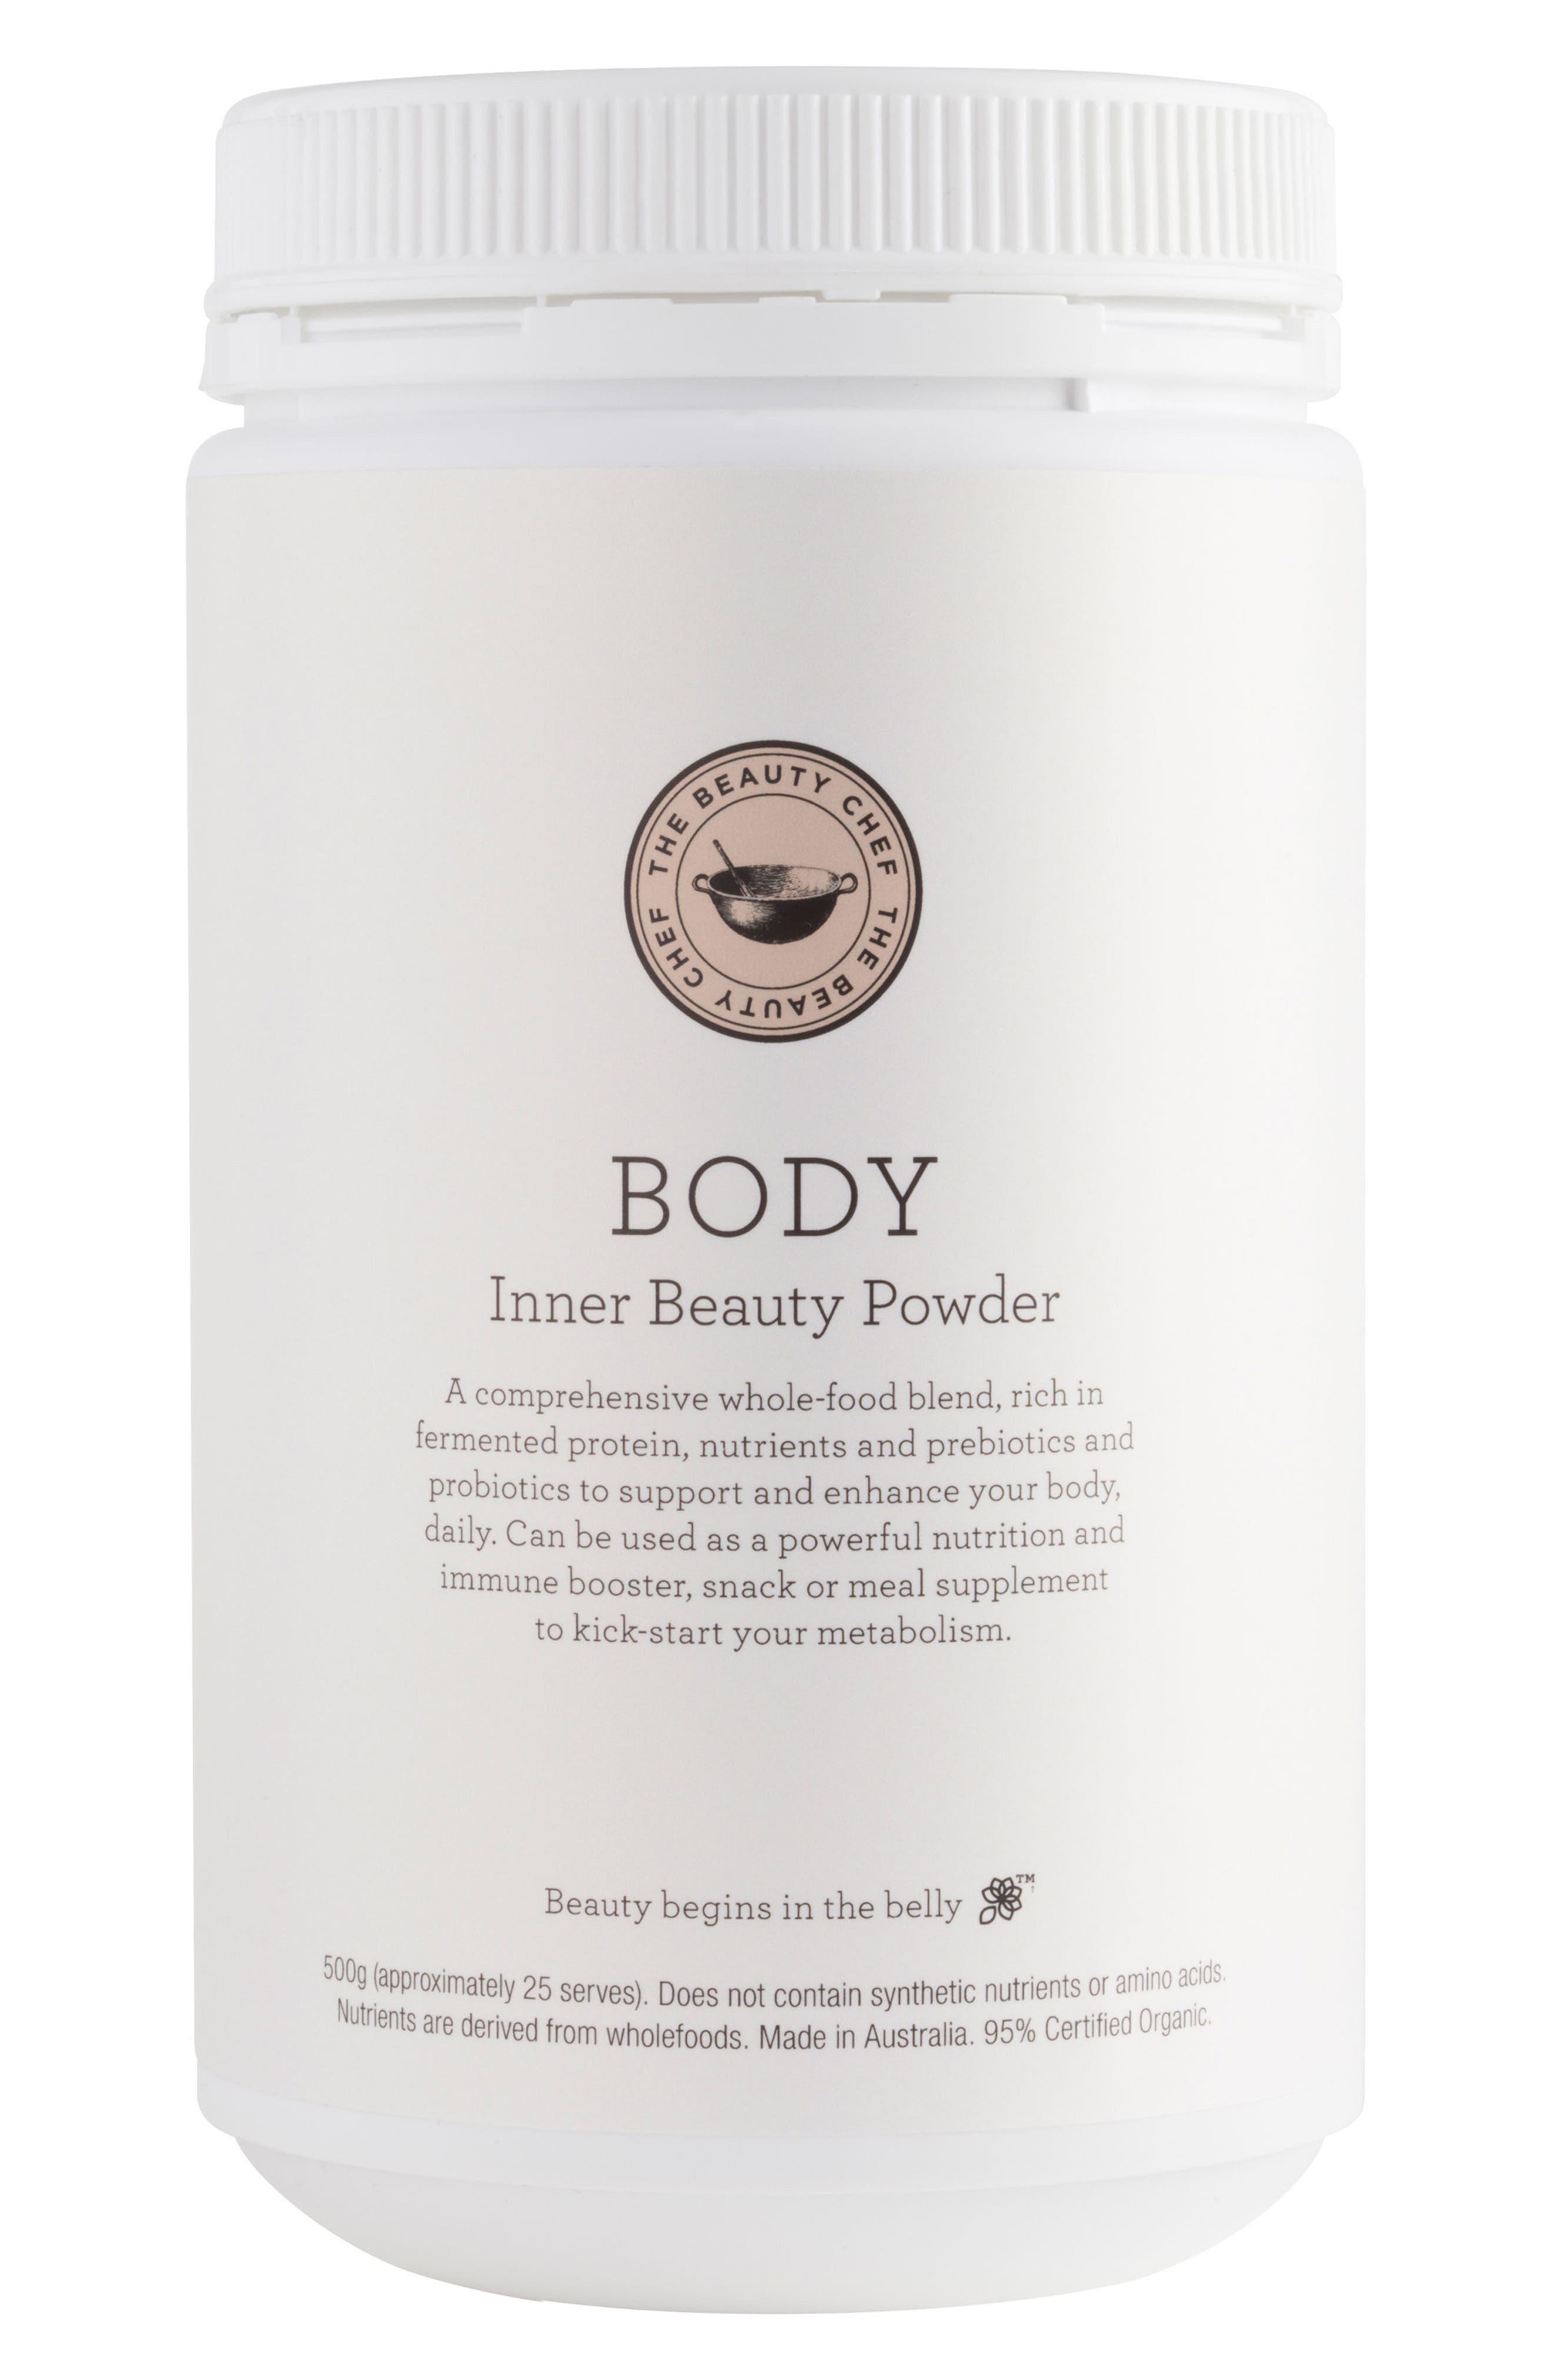 Main Image - The Beauty Chef Body Inner Beauty Powder with Matcha